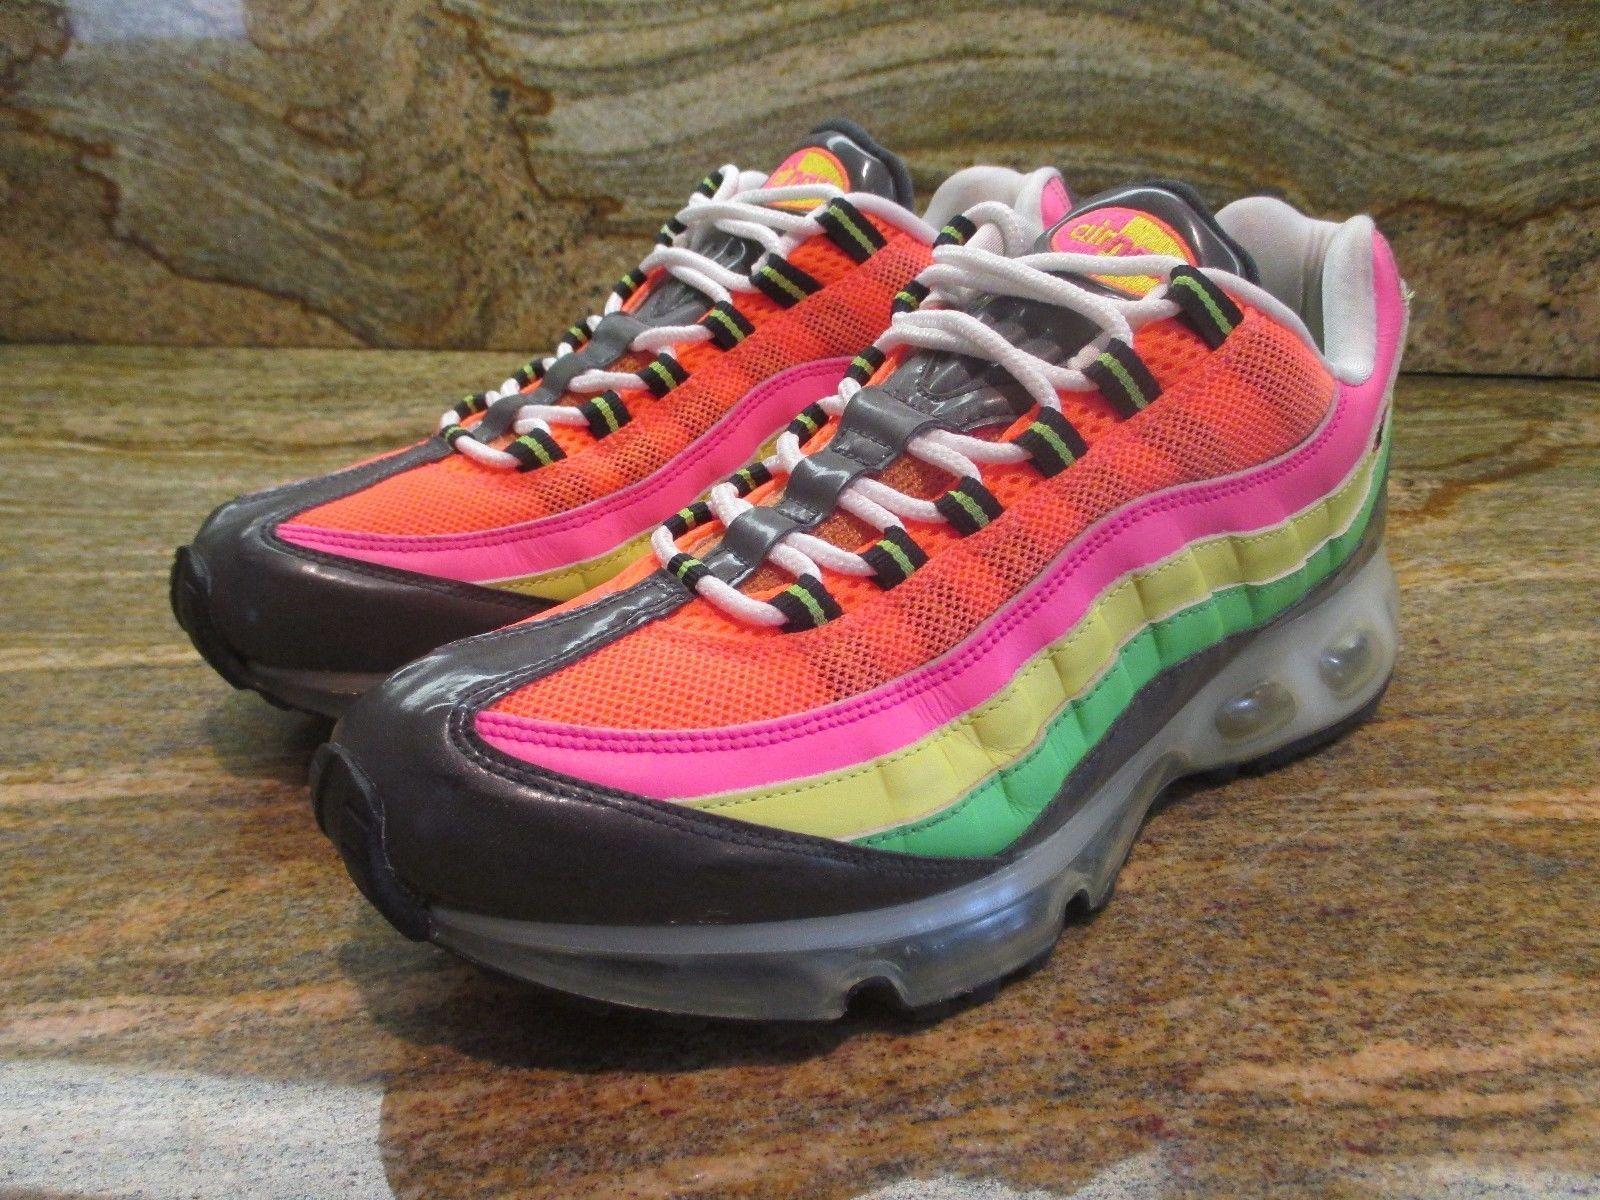 2007 Nike Air Max 95 360 SZ 9.5 Highlighter Rainbow